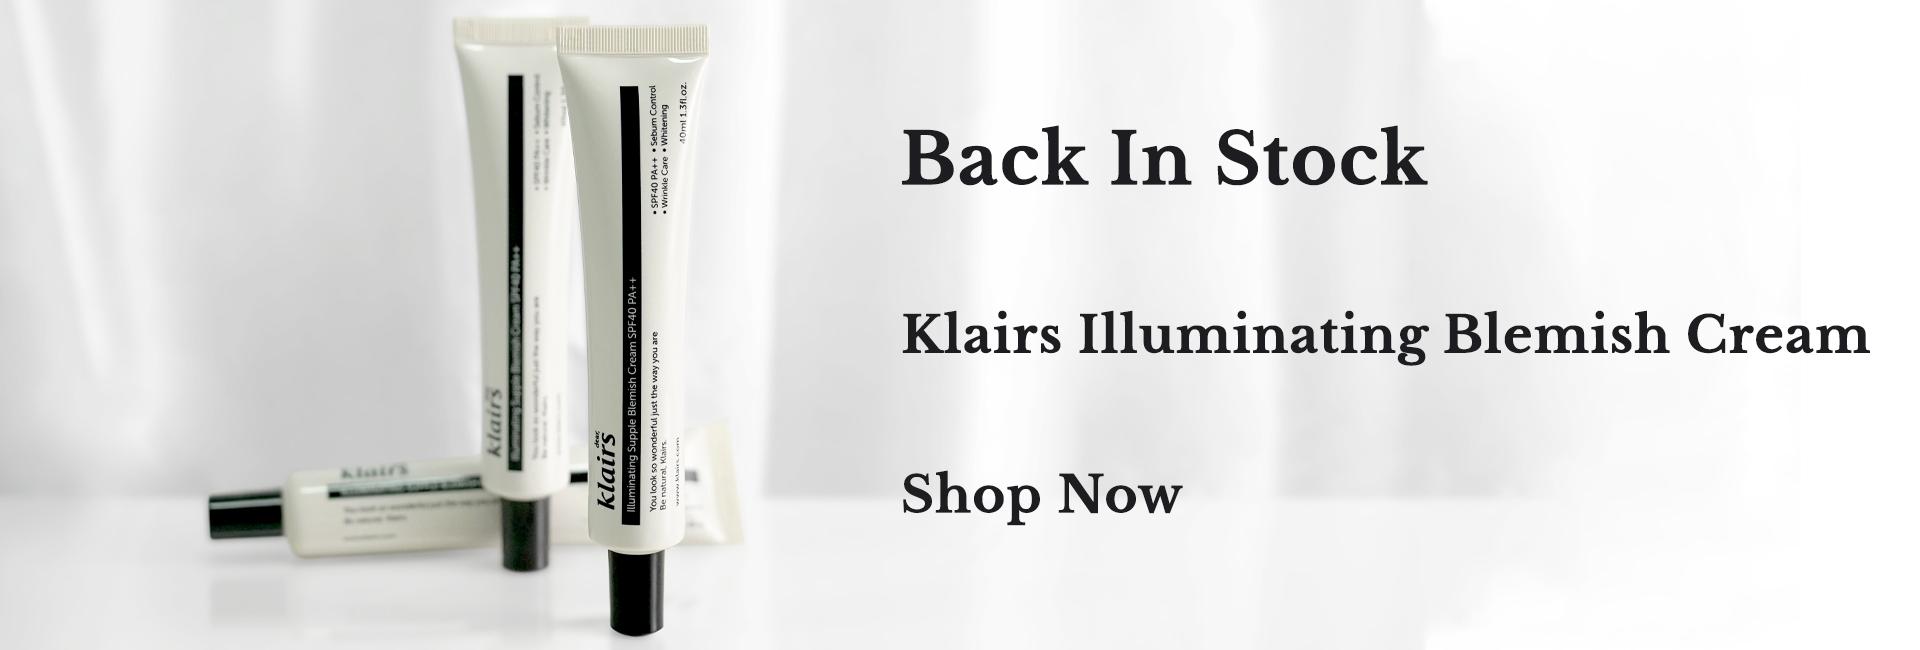 Klairs Illuminating Supple Blemish Cream - back in stock